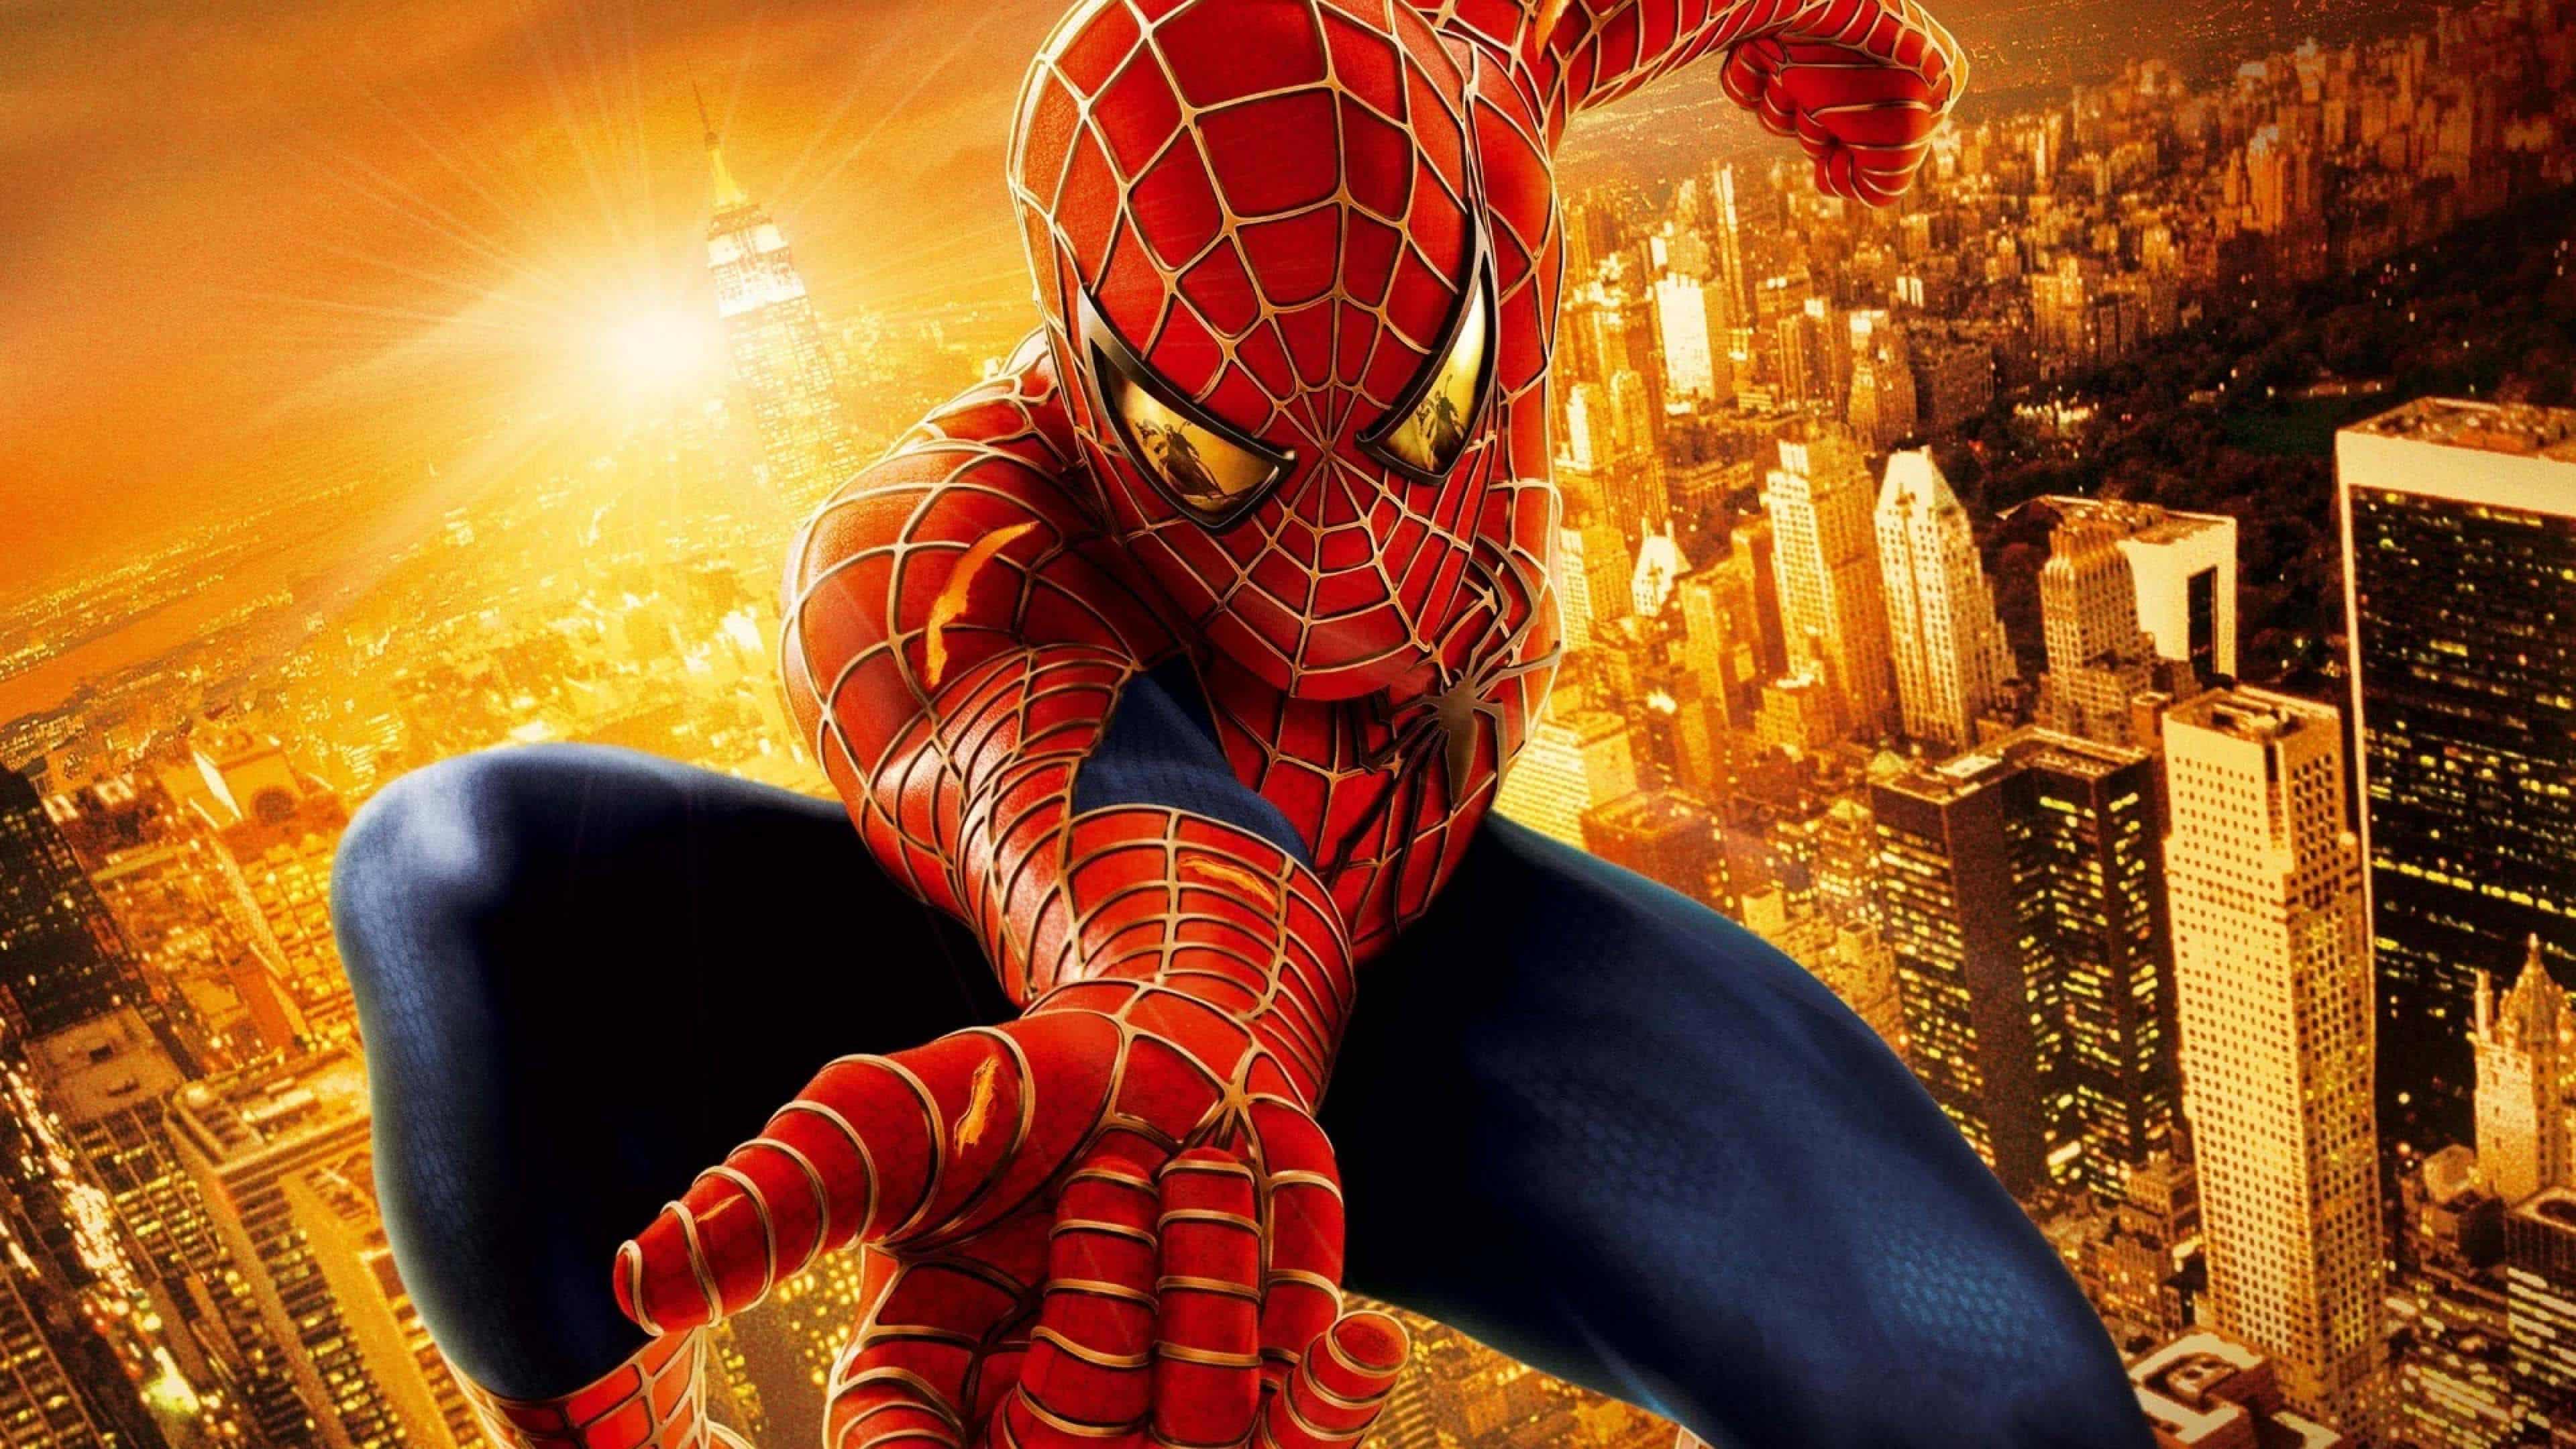 Spider Man Uhd 4k Wallpaper Pixelz